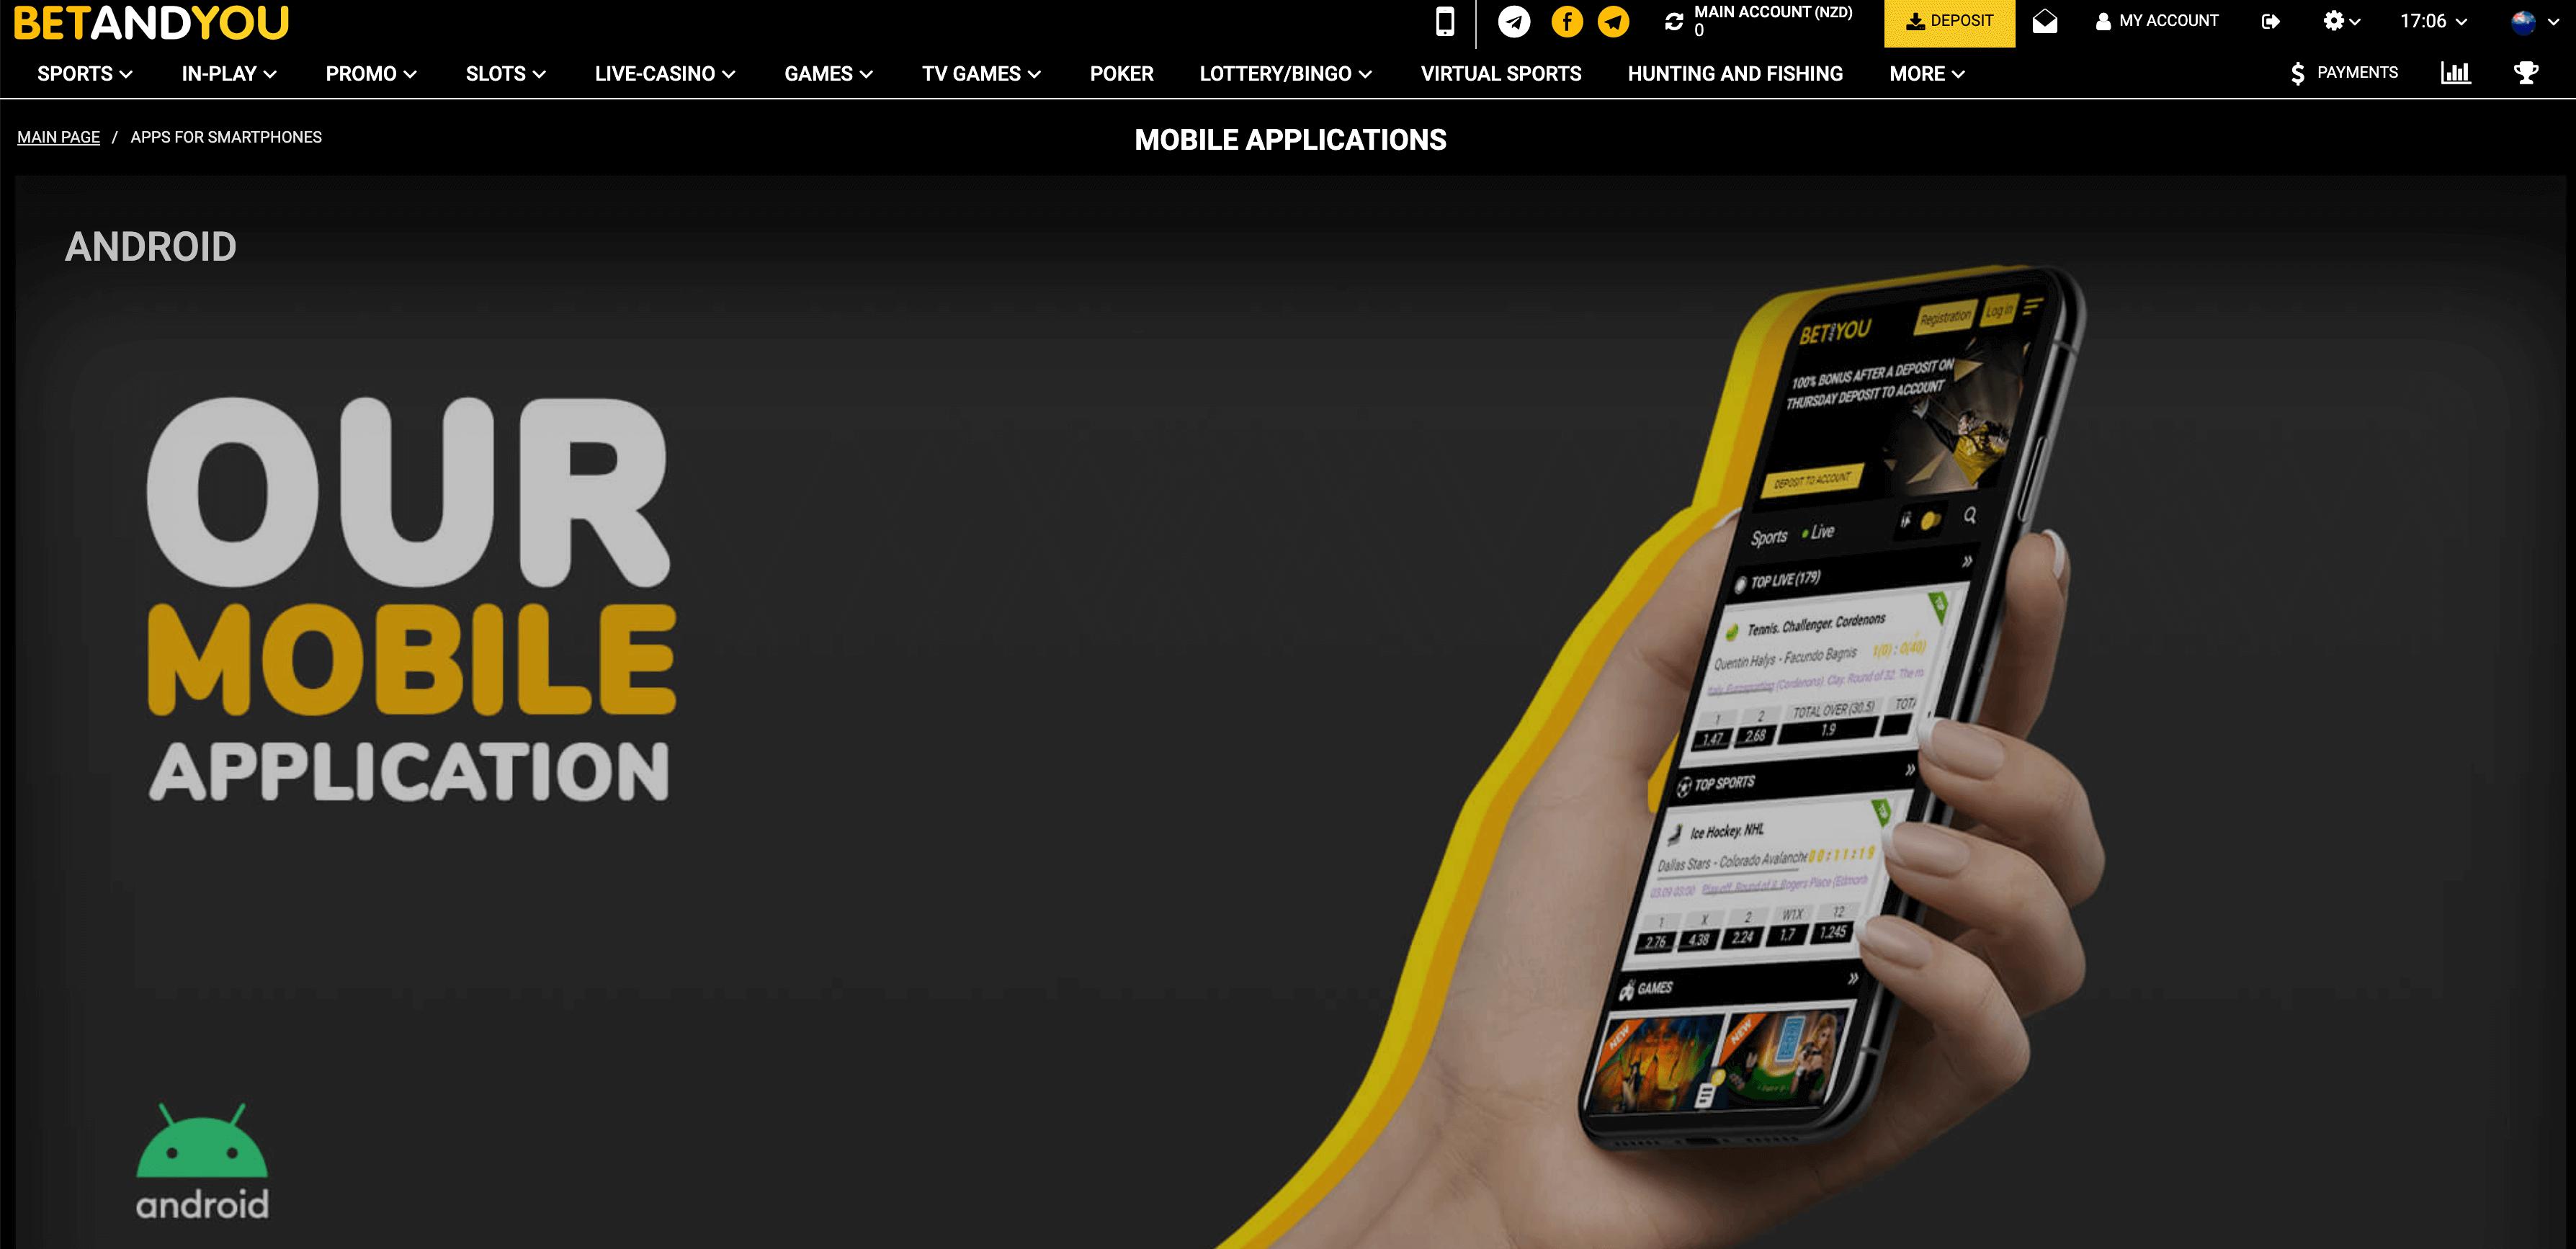 betandyou app mobile